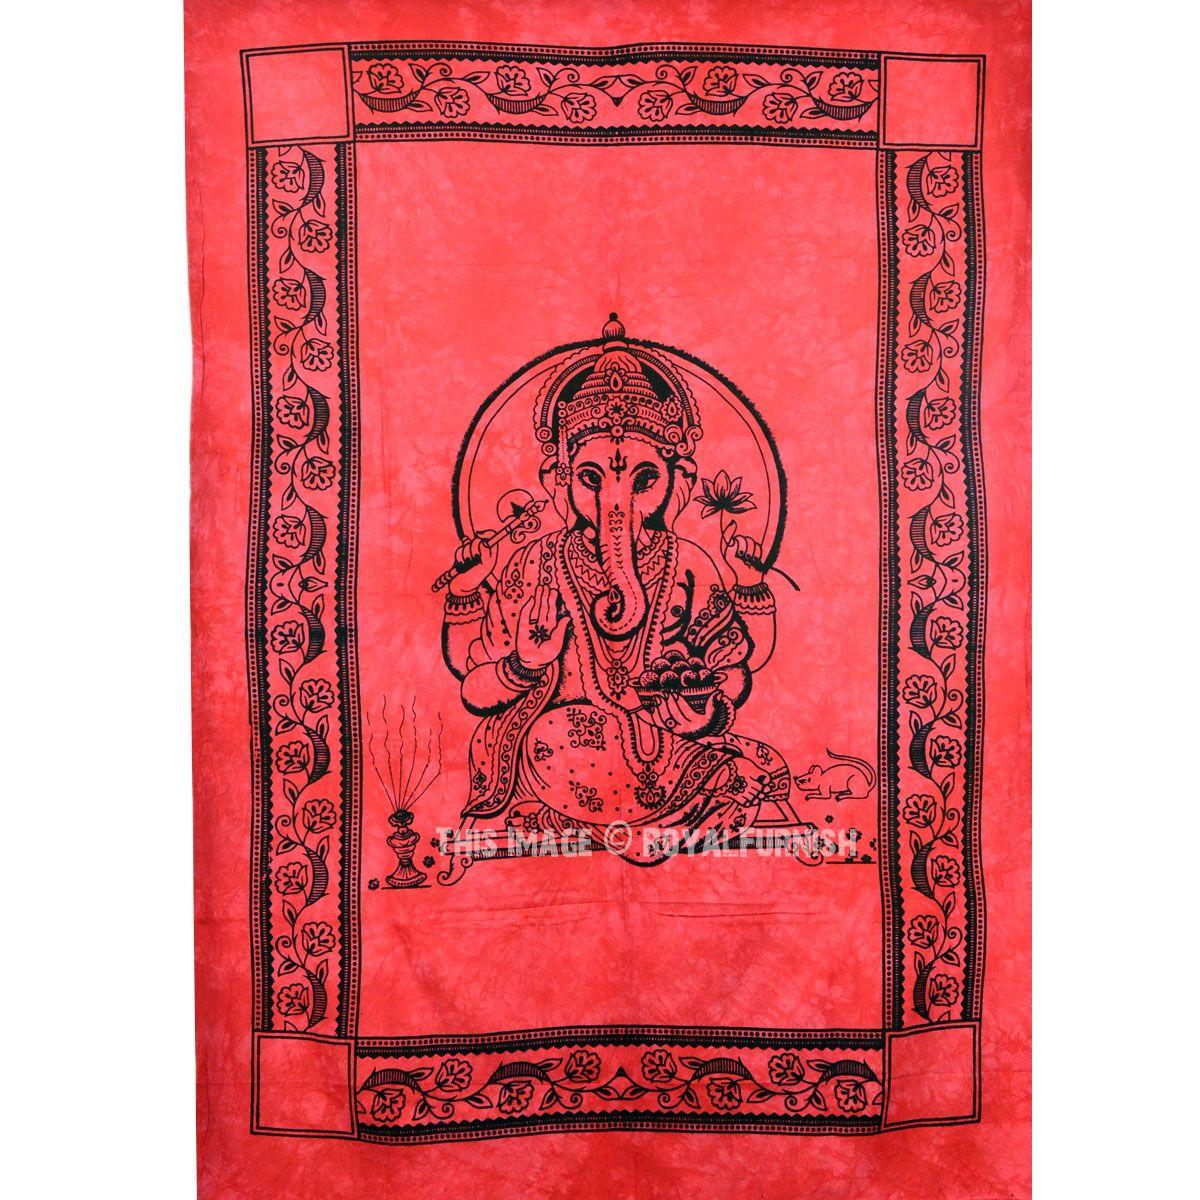 Red Hindu Elephant God Ganesha Tapestry Wall Hanging Fringed Wall Tapestry Royalfurnish Com Elephant God Hindu Elephant Elephant God Ganesha